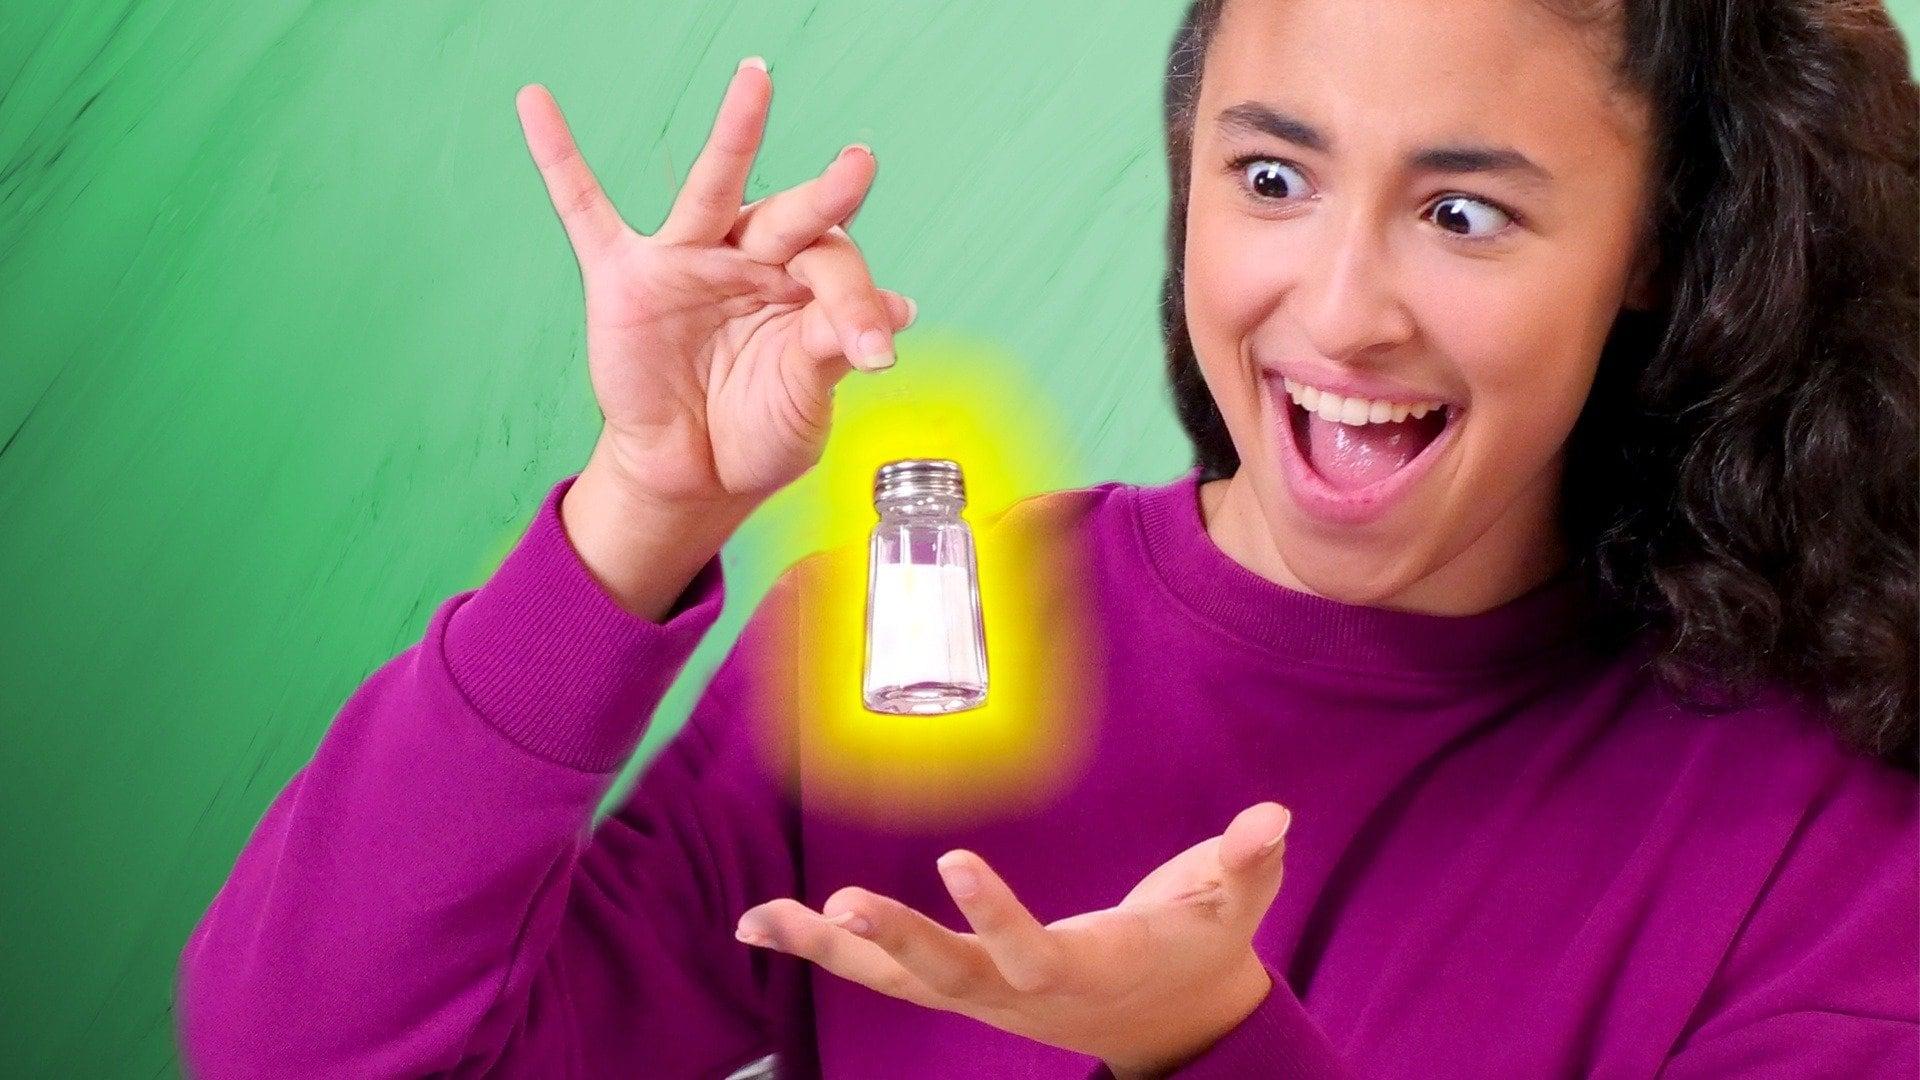 Levitating Salt Shaker Trick